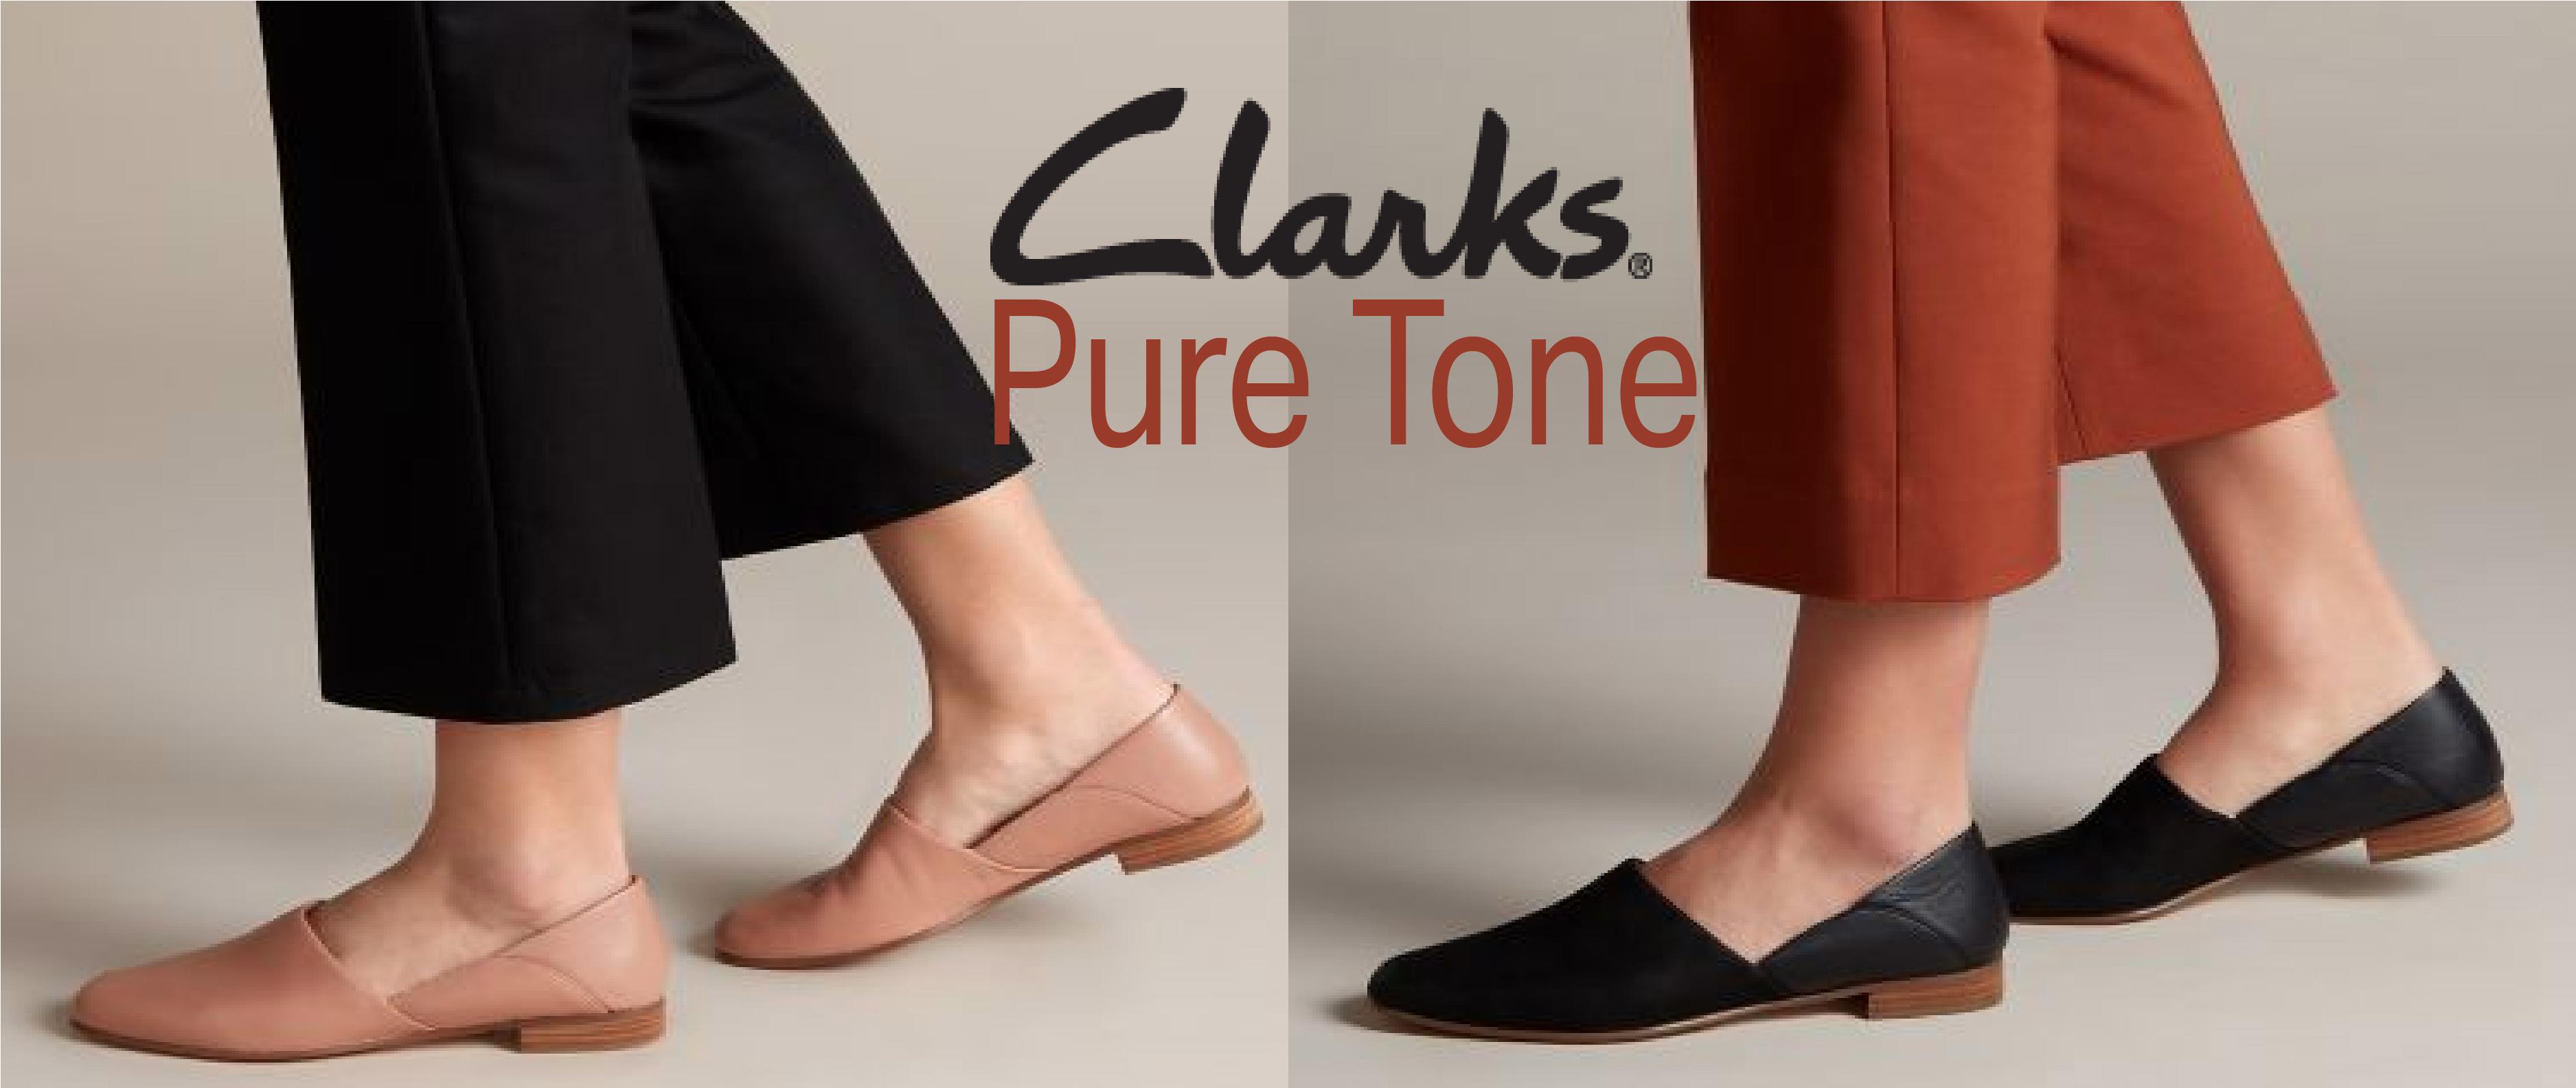 Clarks Pure Tone